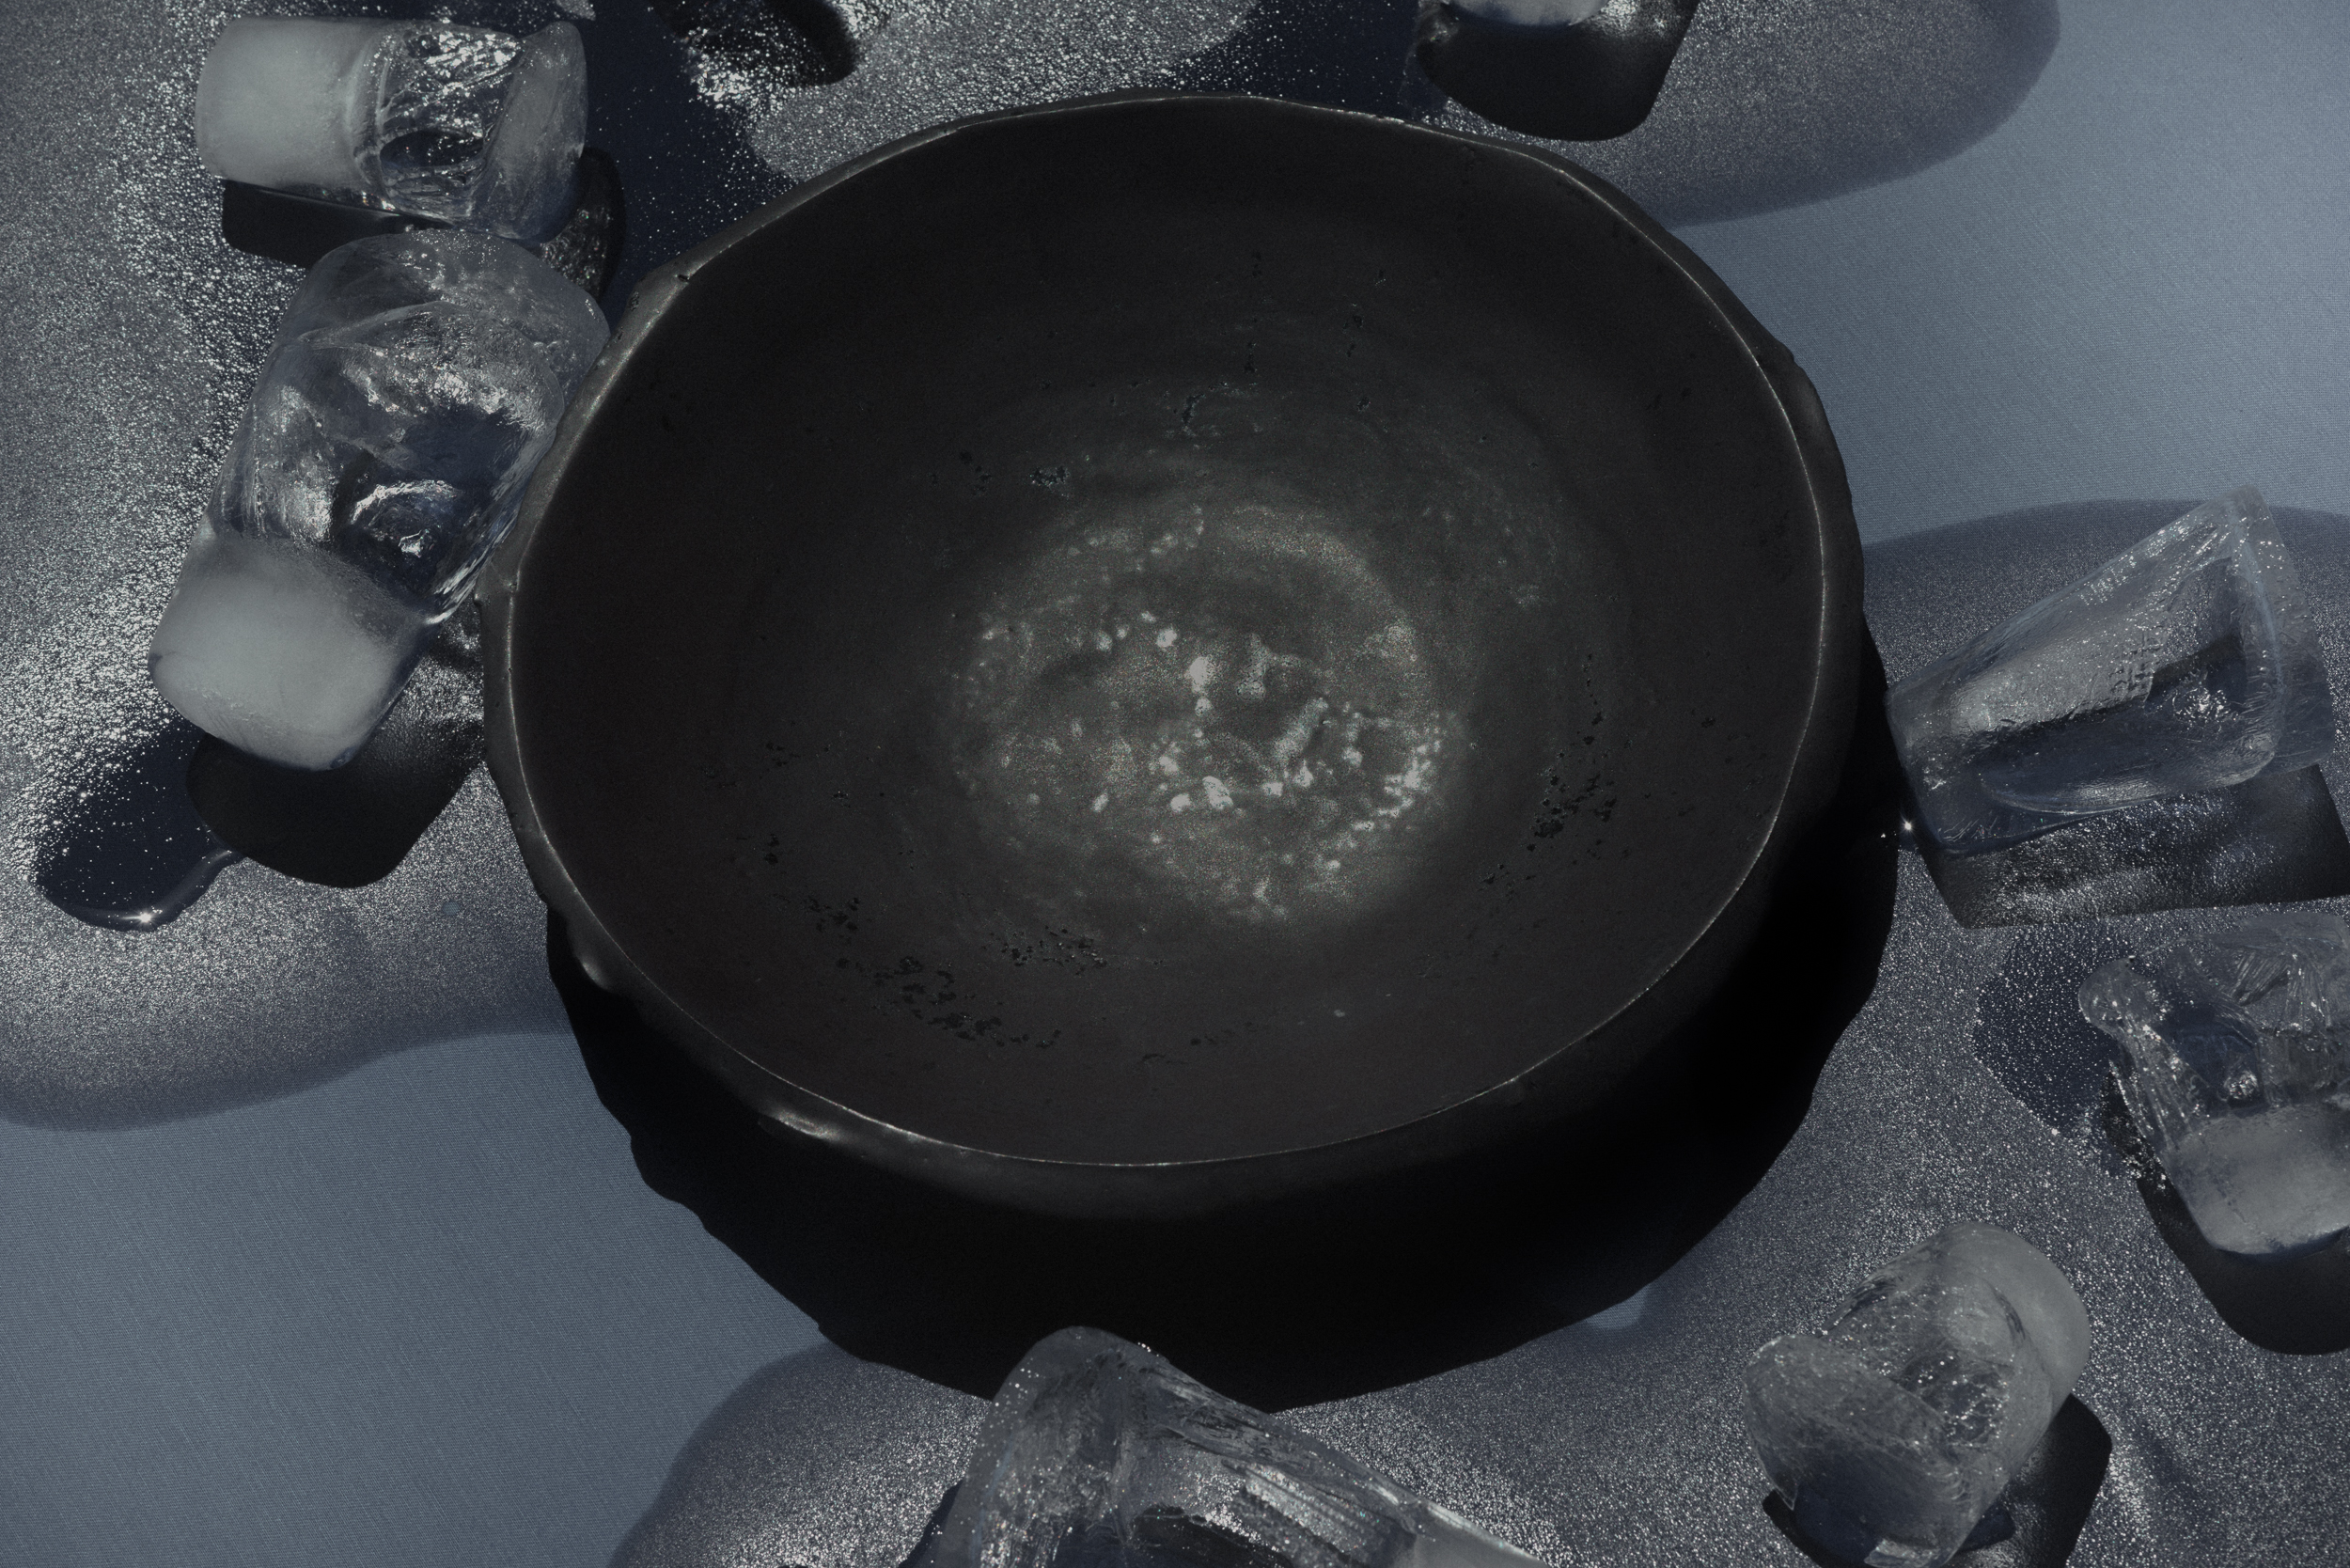 ice_cubes_bowl_talbletop_blue_2500px_srgb_72dpi (2).jpg